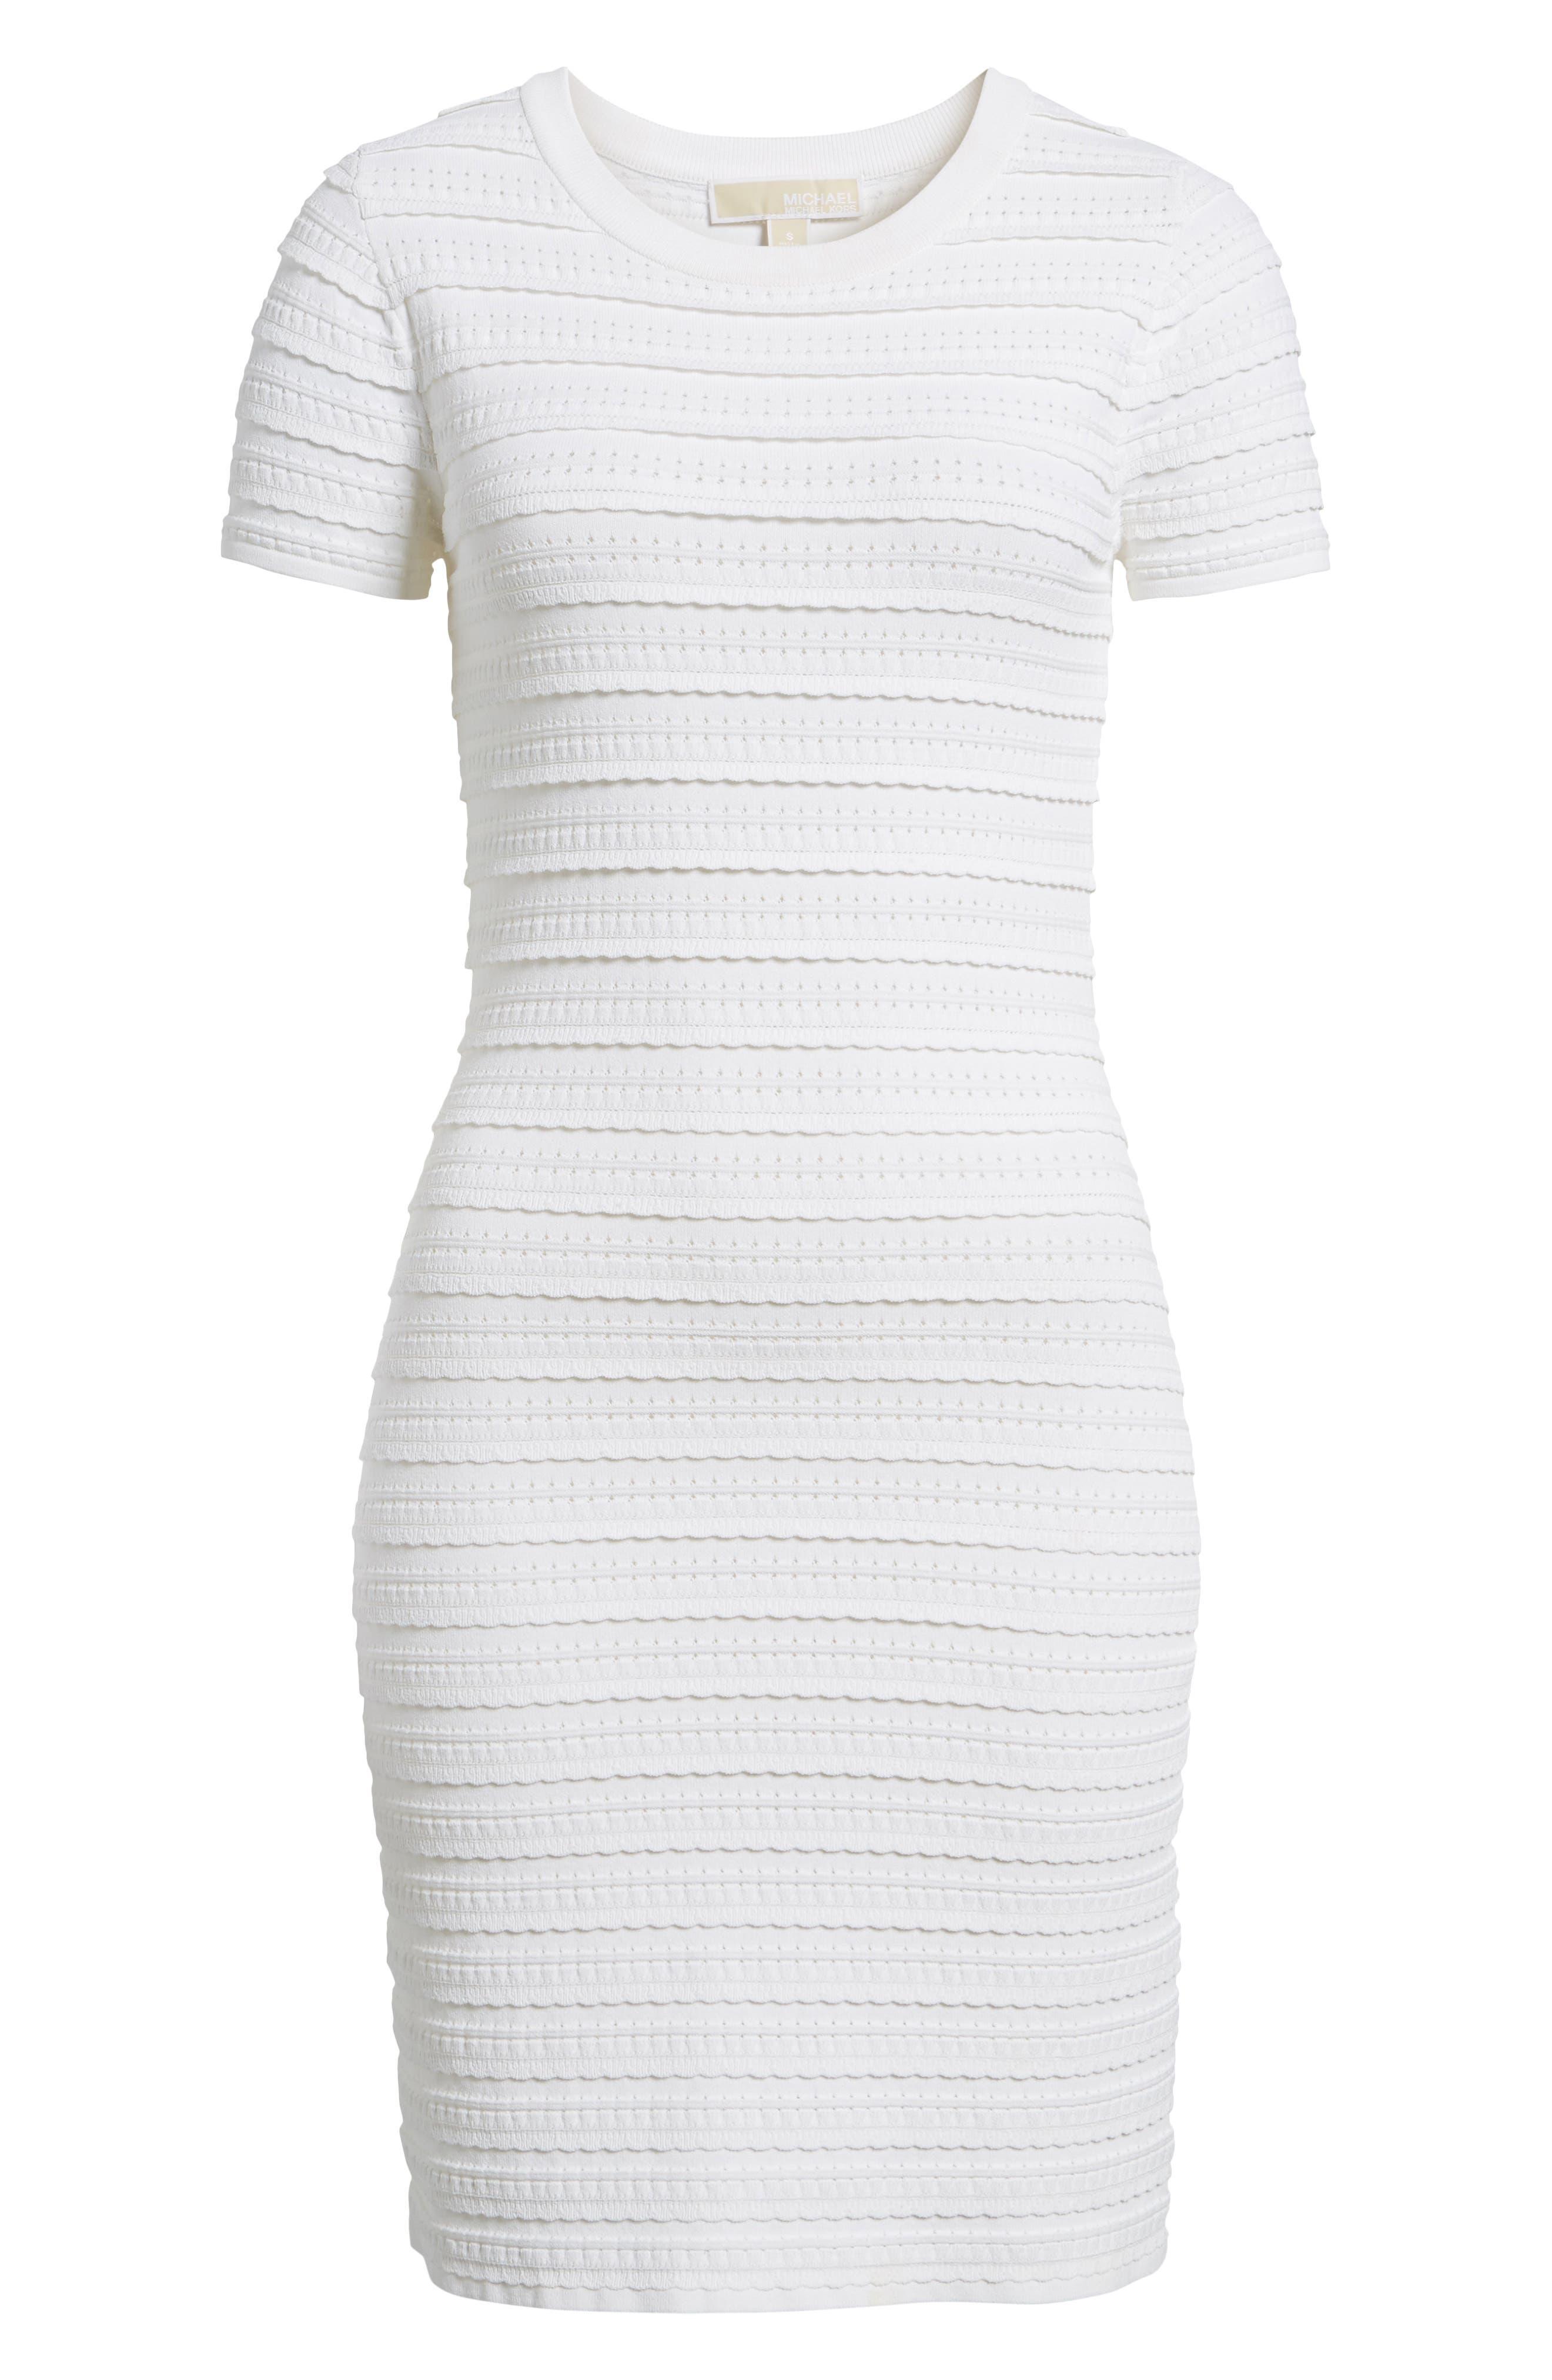 Tiered Sheath Dress,                             Alternate thumbnail 6, color,                             White